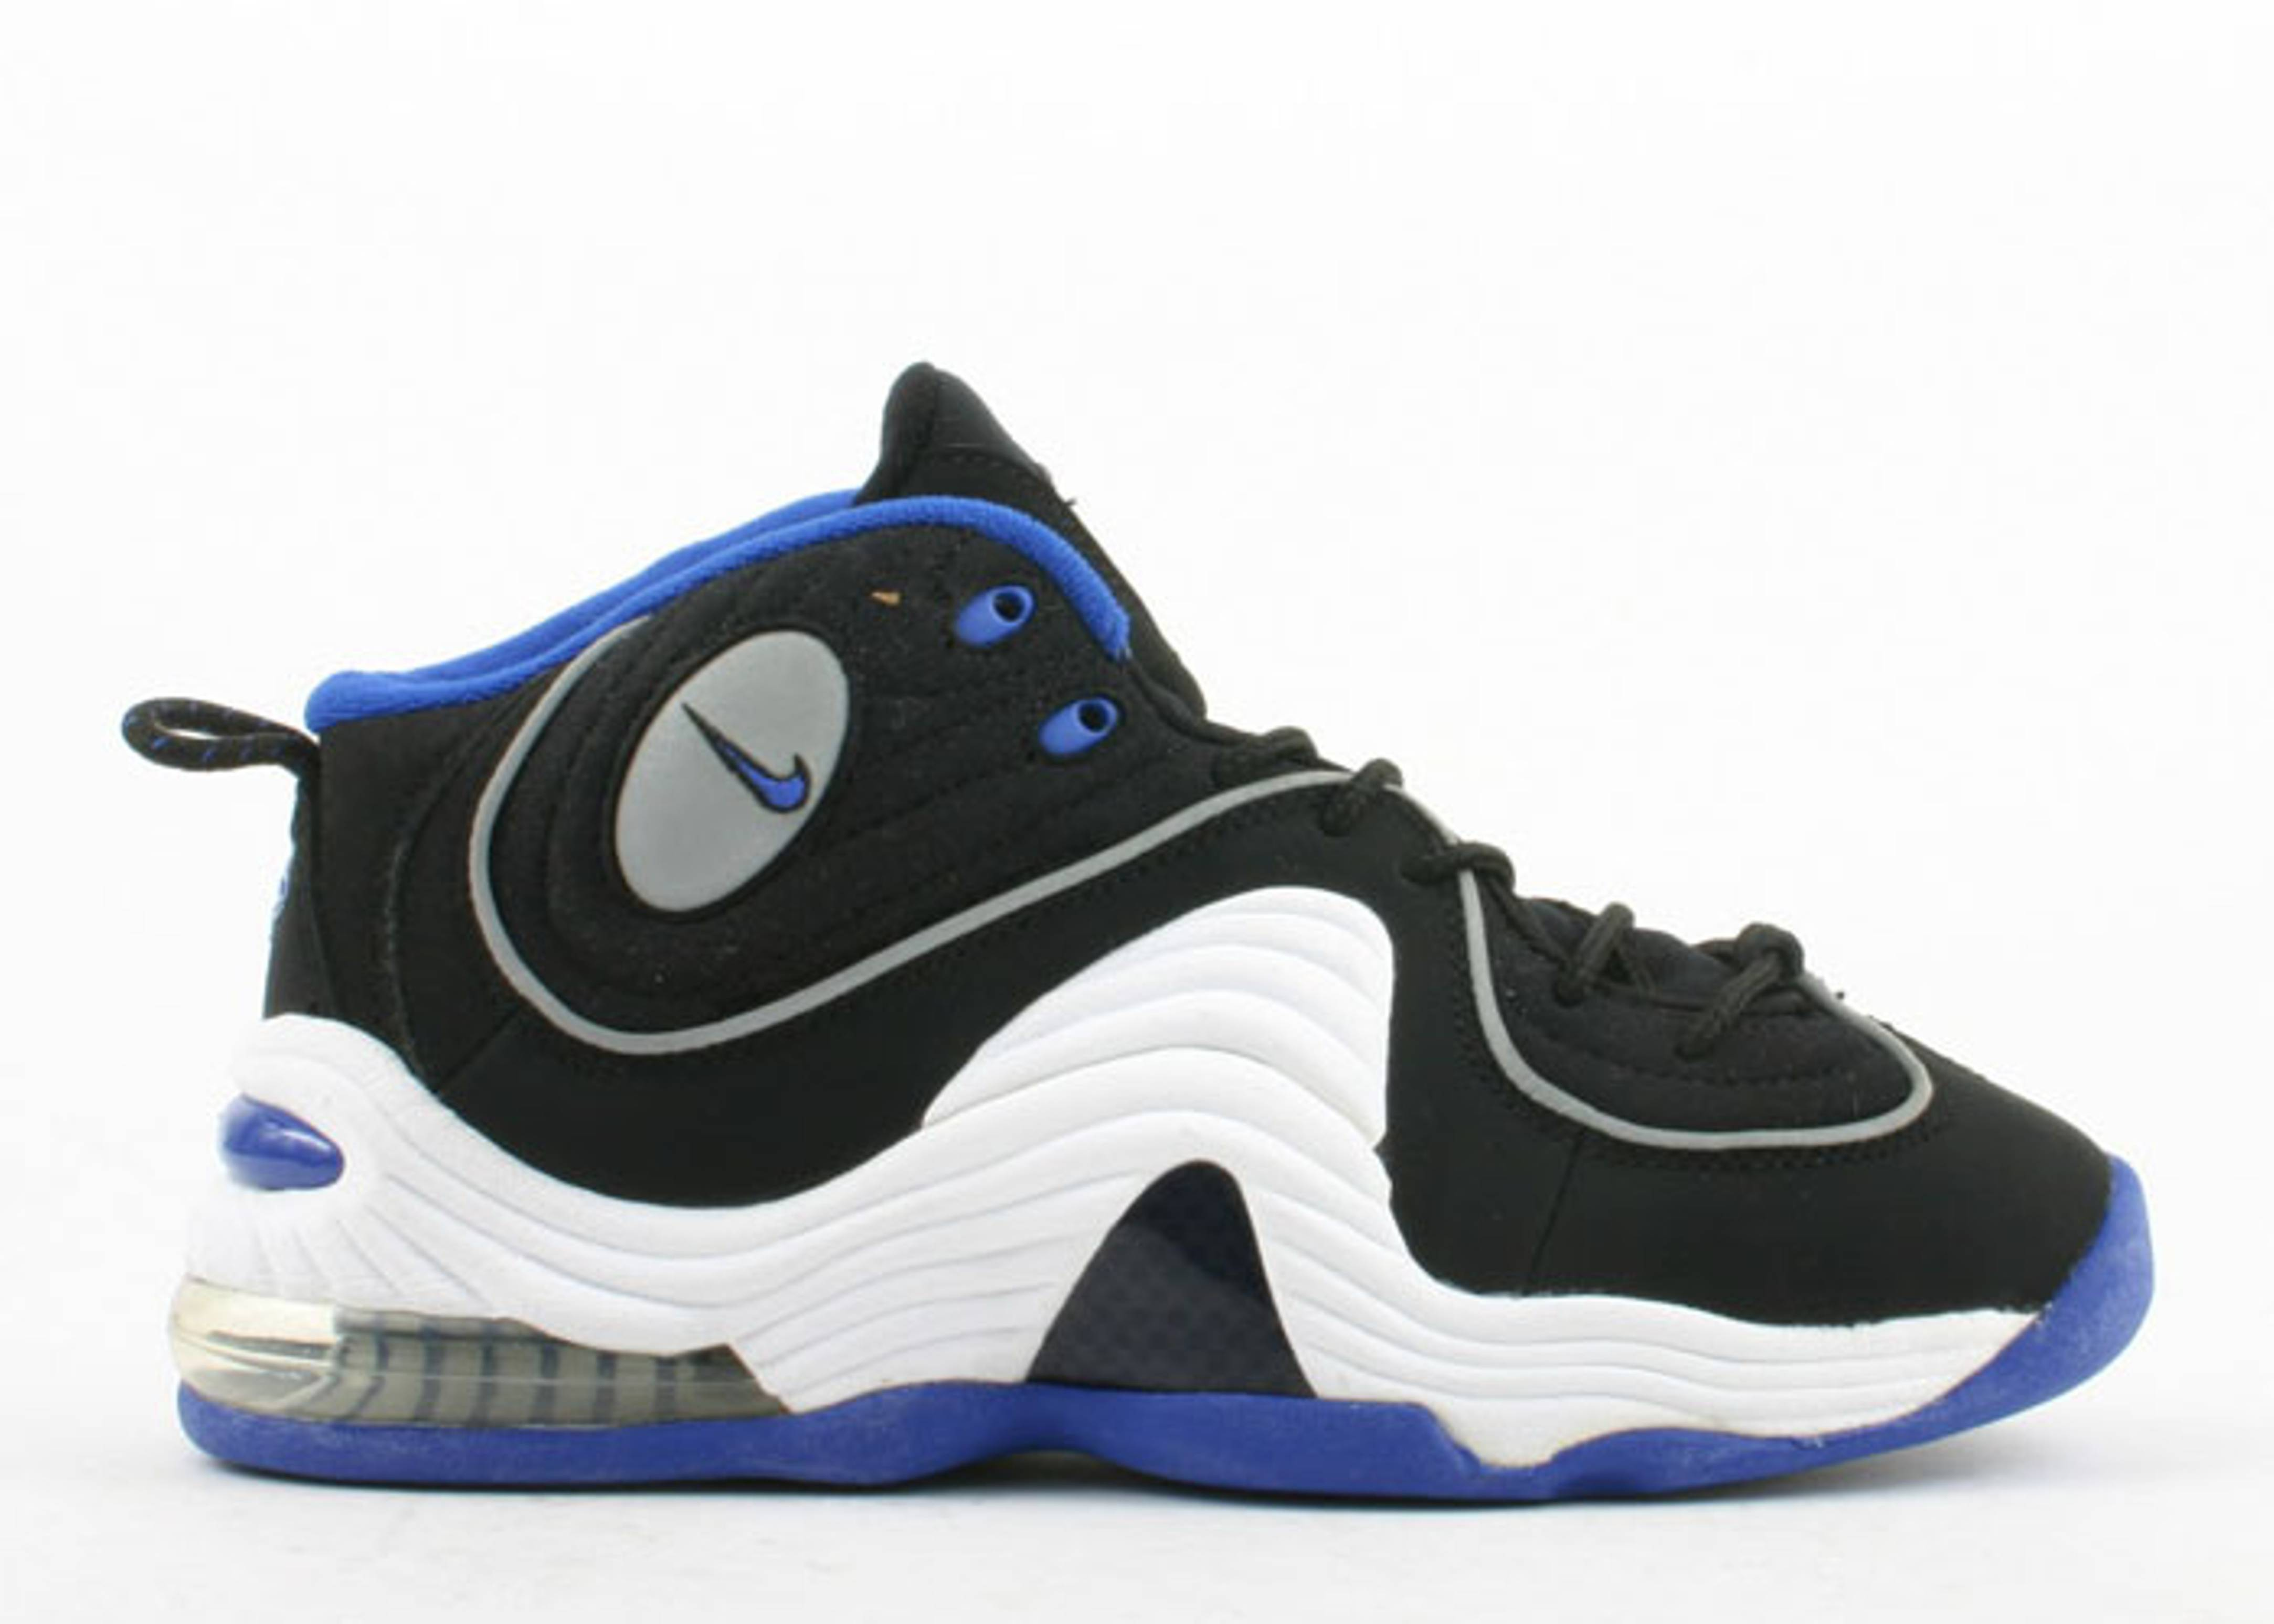 release date b01f4 f2a3c Air Penny (bg) Gs